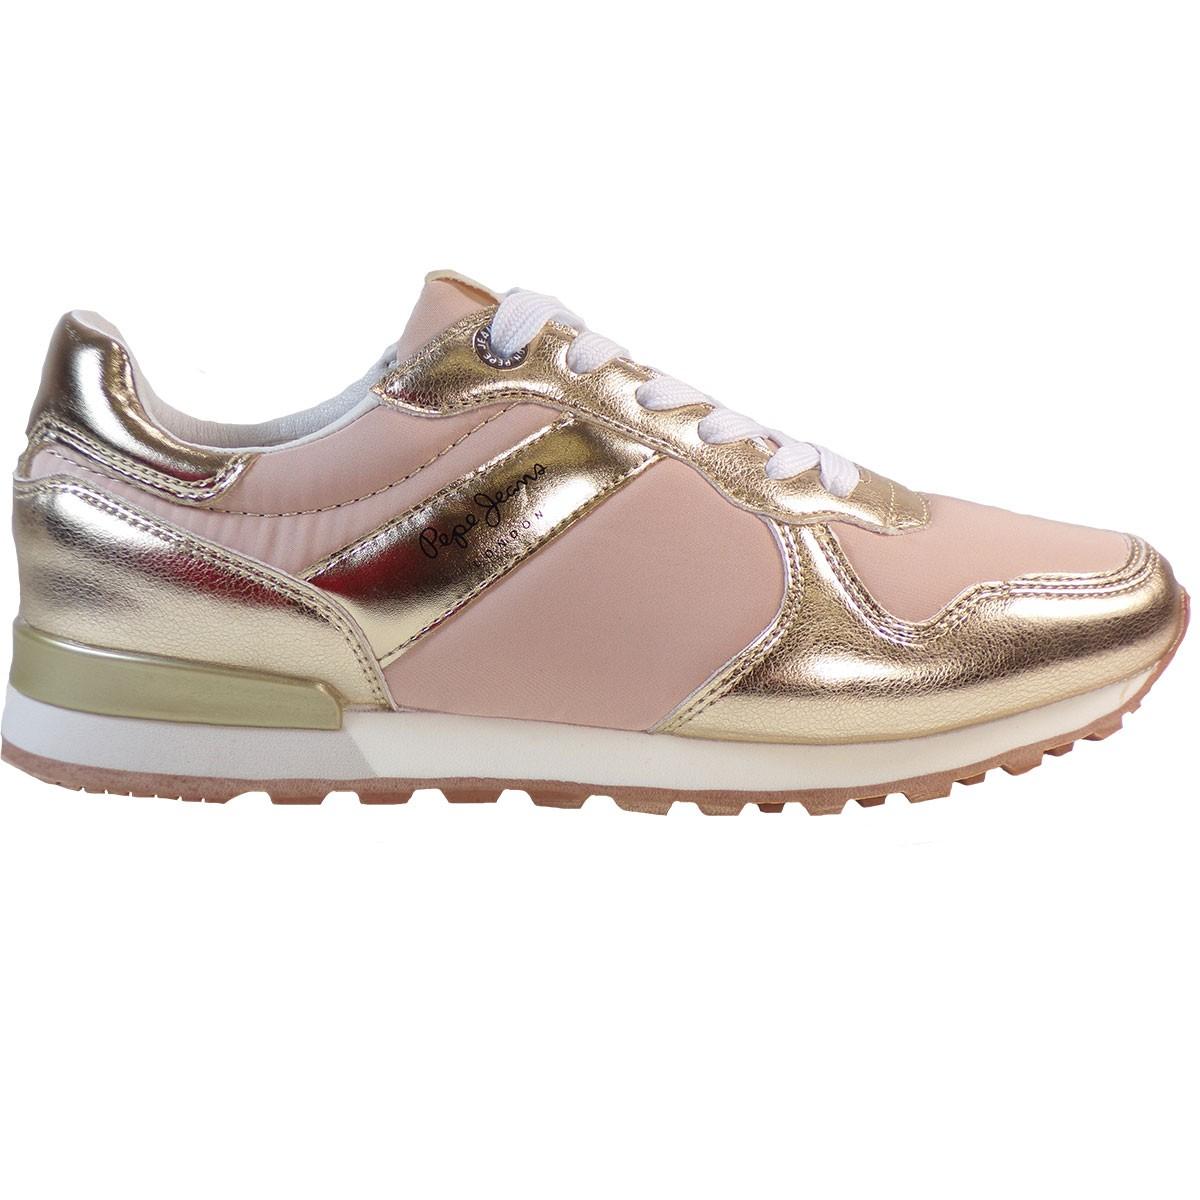 61ba46f7760 Pepe jeans VERONA Sneakers Γυναικεία Παπούτσια PLS30873-099 Ροζ-Χρυσό